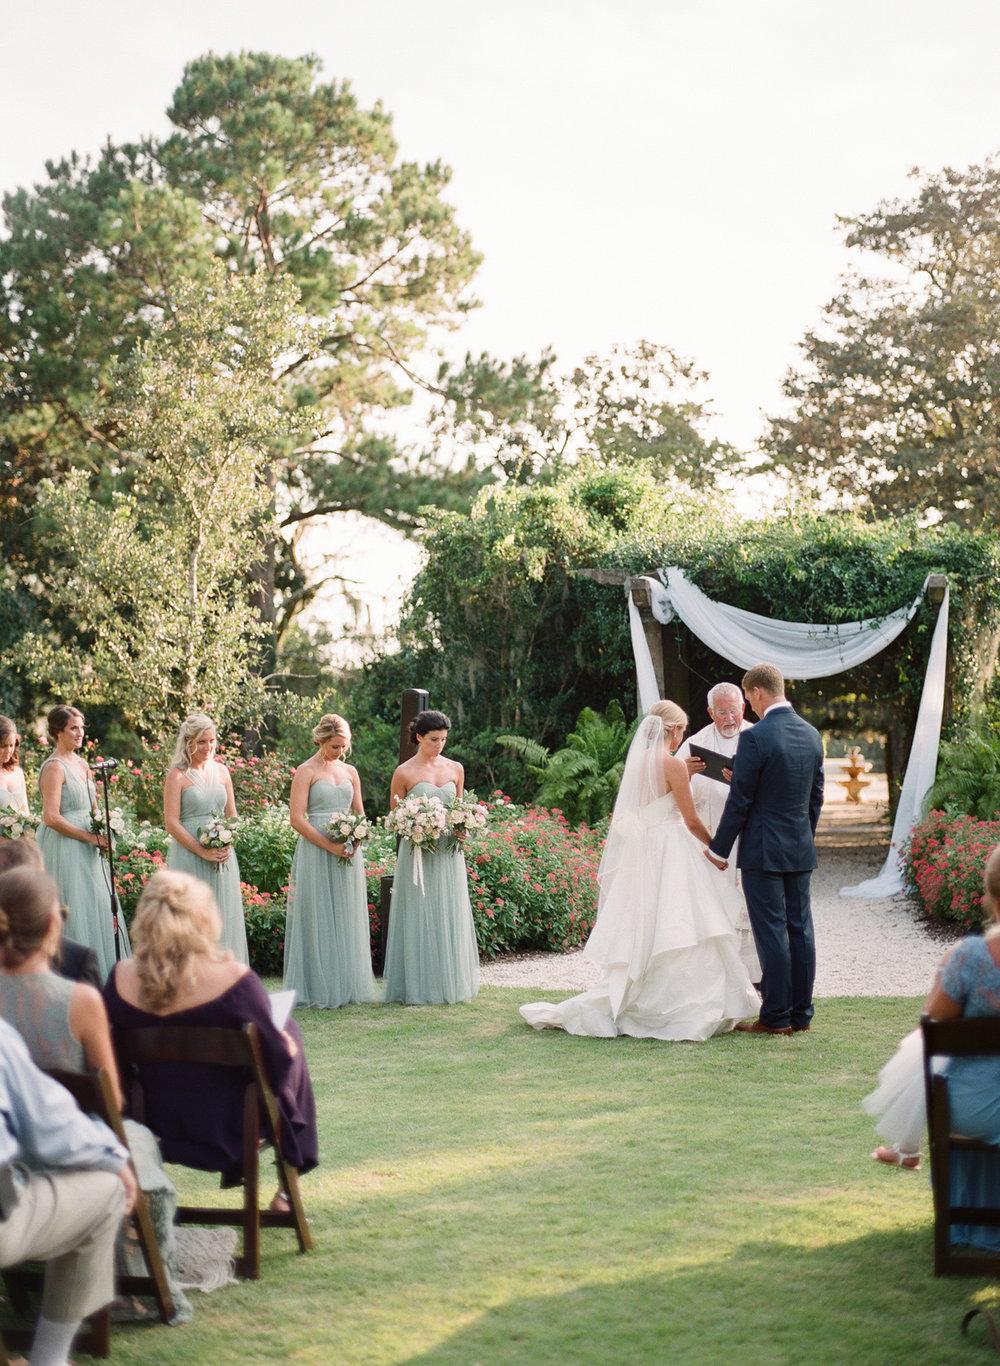 Airlie-Gardens-Wedding-43.jpg